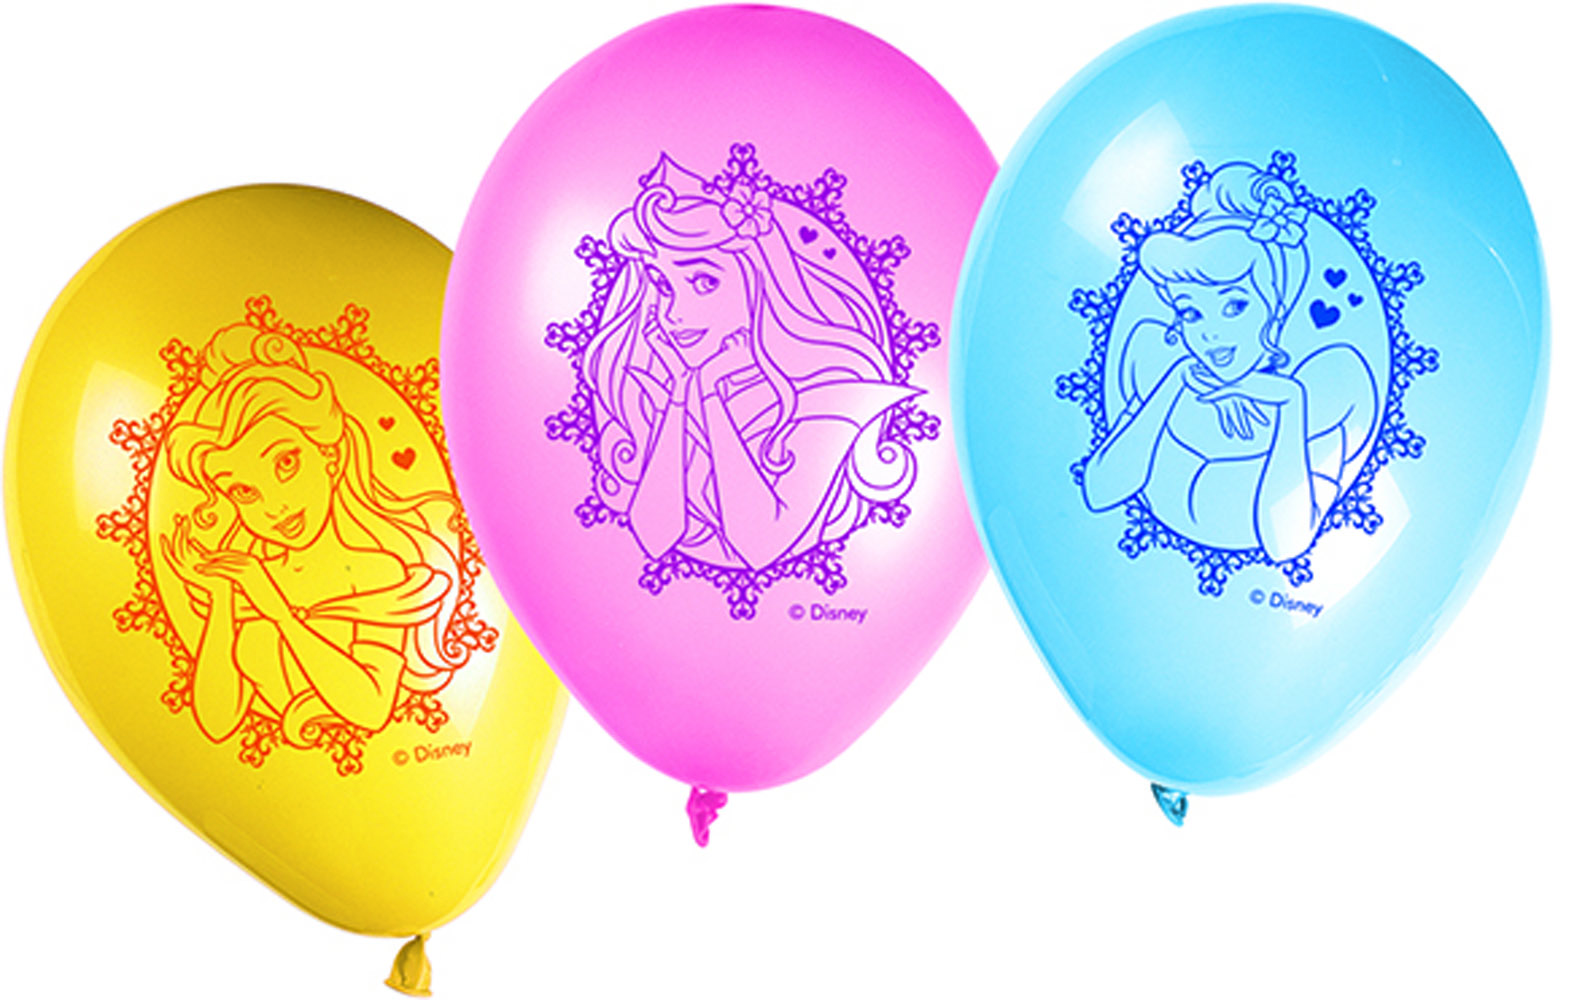 Ballon Princesse Glamour - Disney? x8